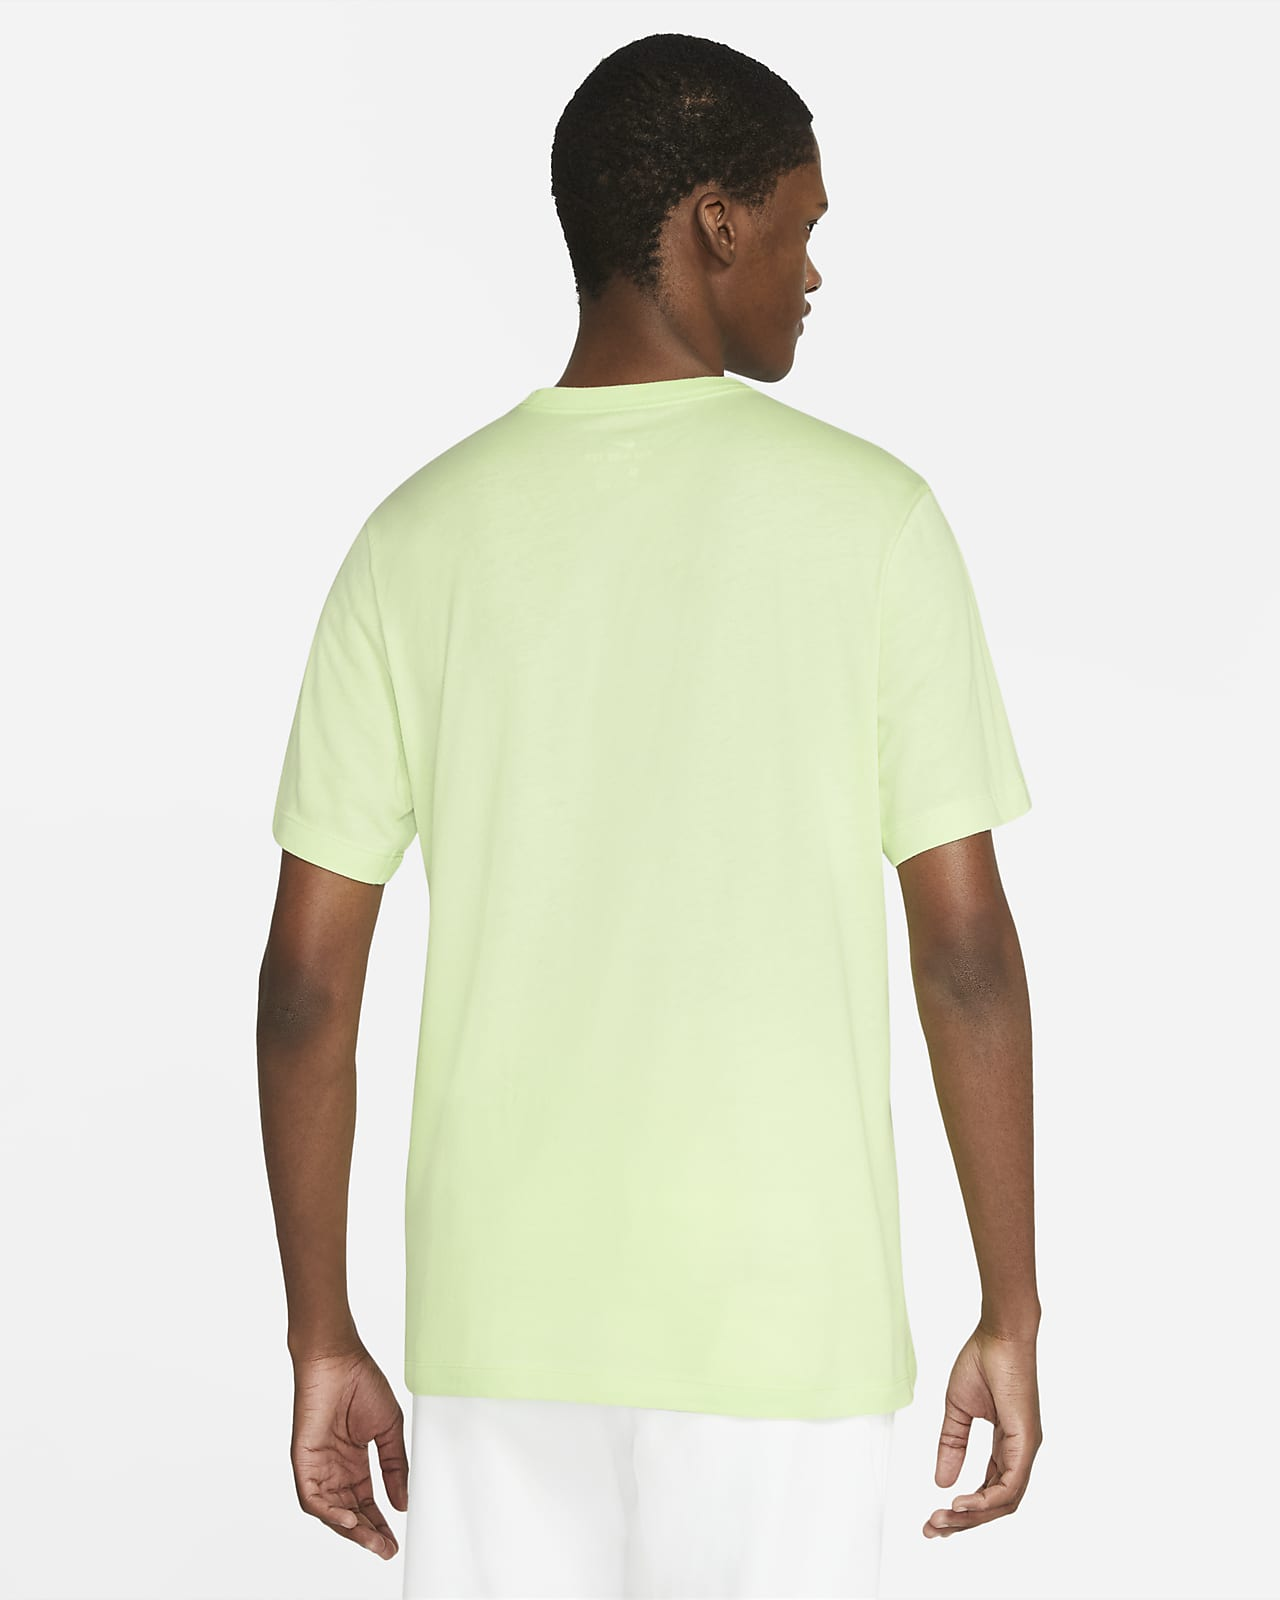 Club Room Homme Bulldog Tuxedo Graphique Ras Du Cou Pullover T-shirt BHFO 7942